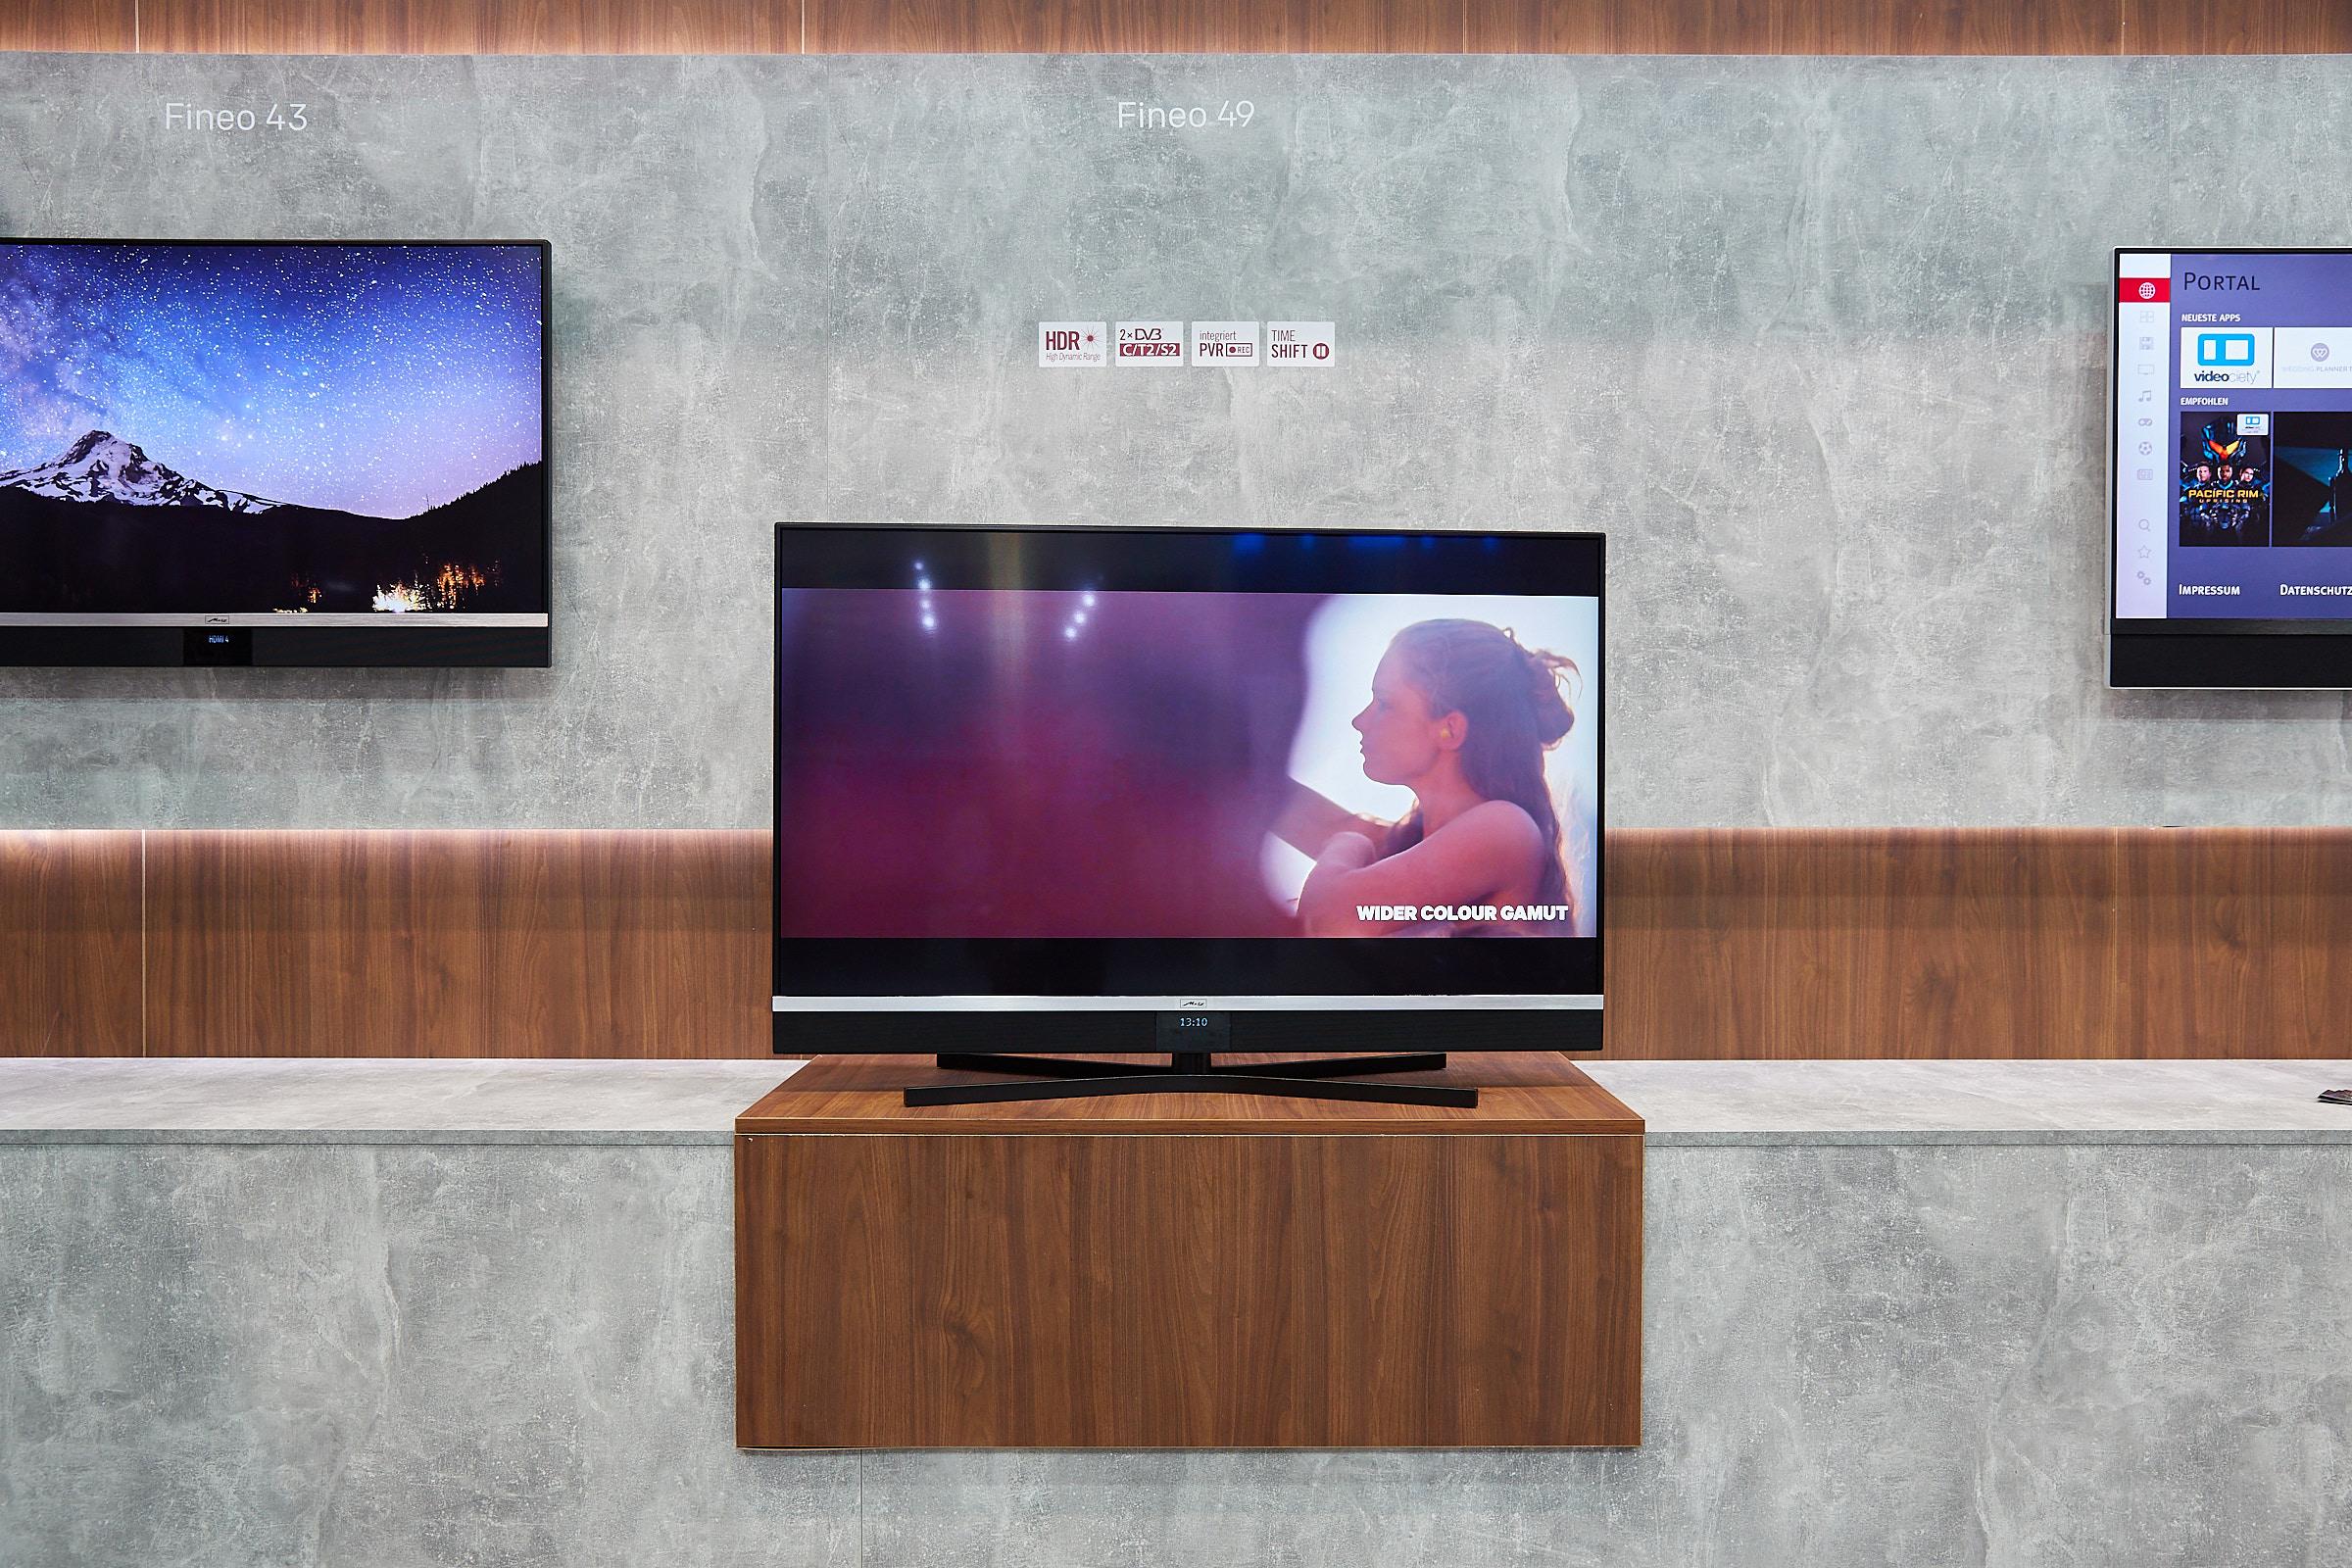 Metz Fineo UHD TV 43 und 49 Zoll